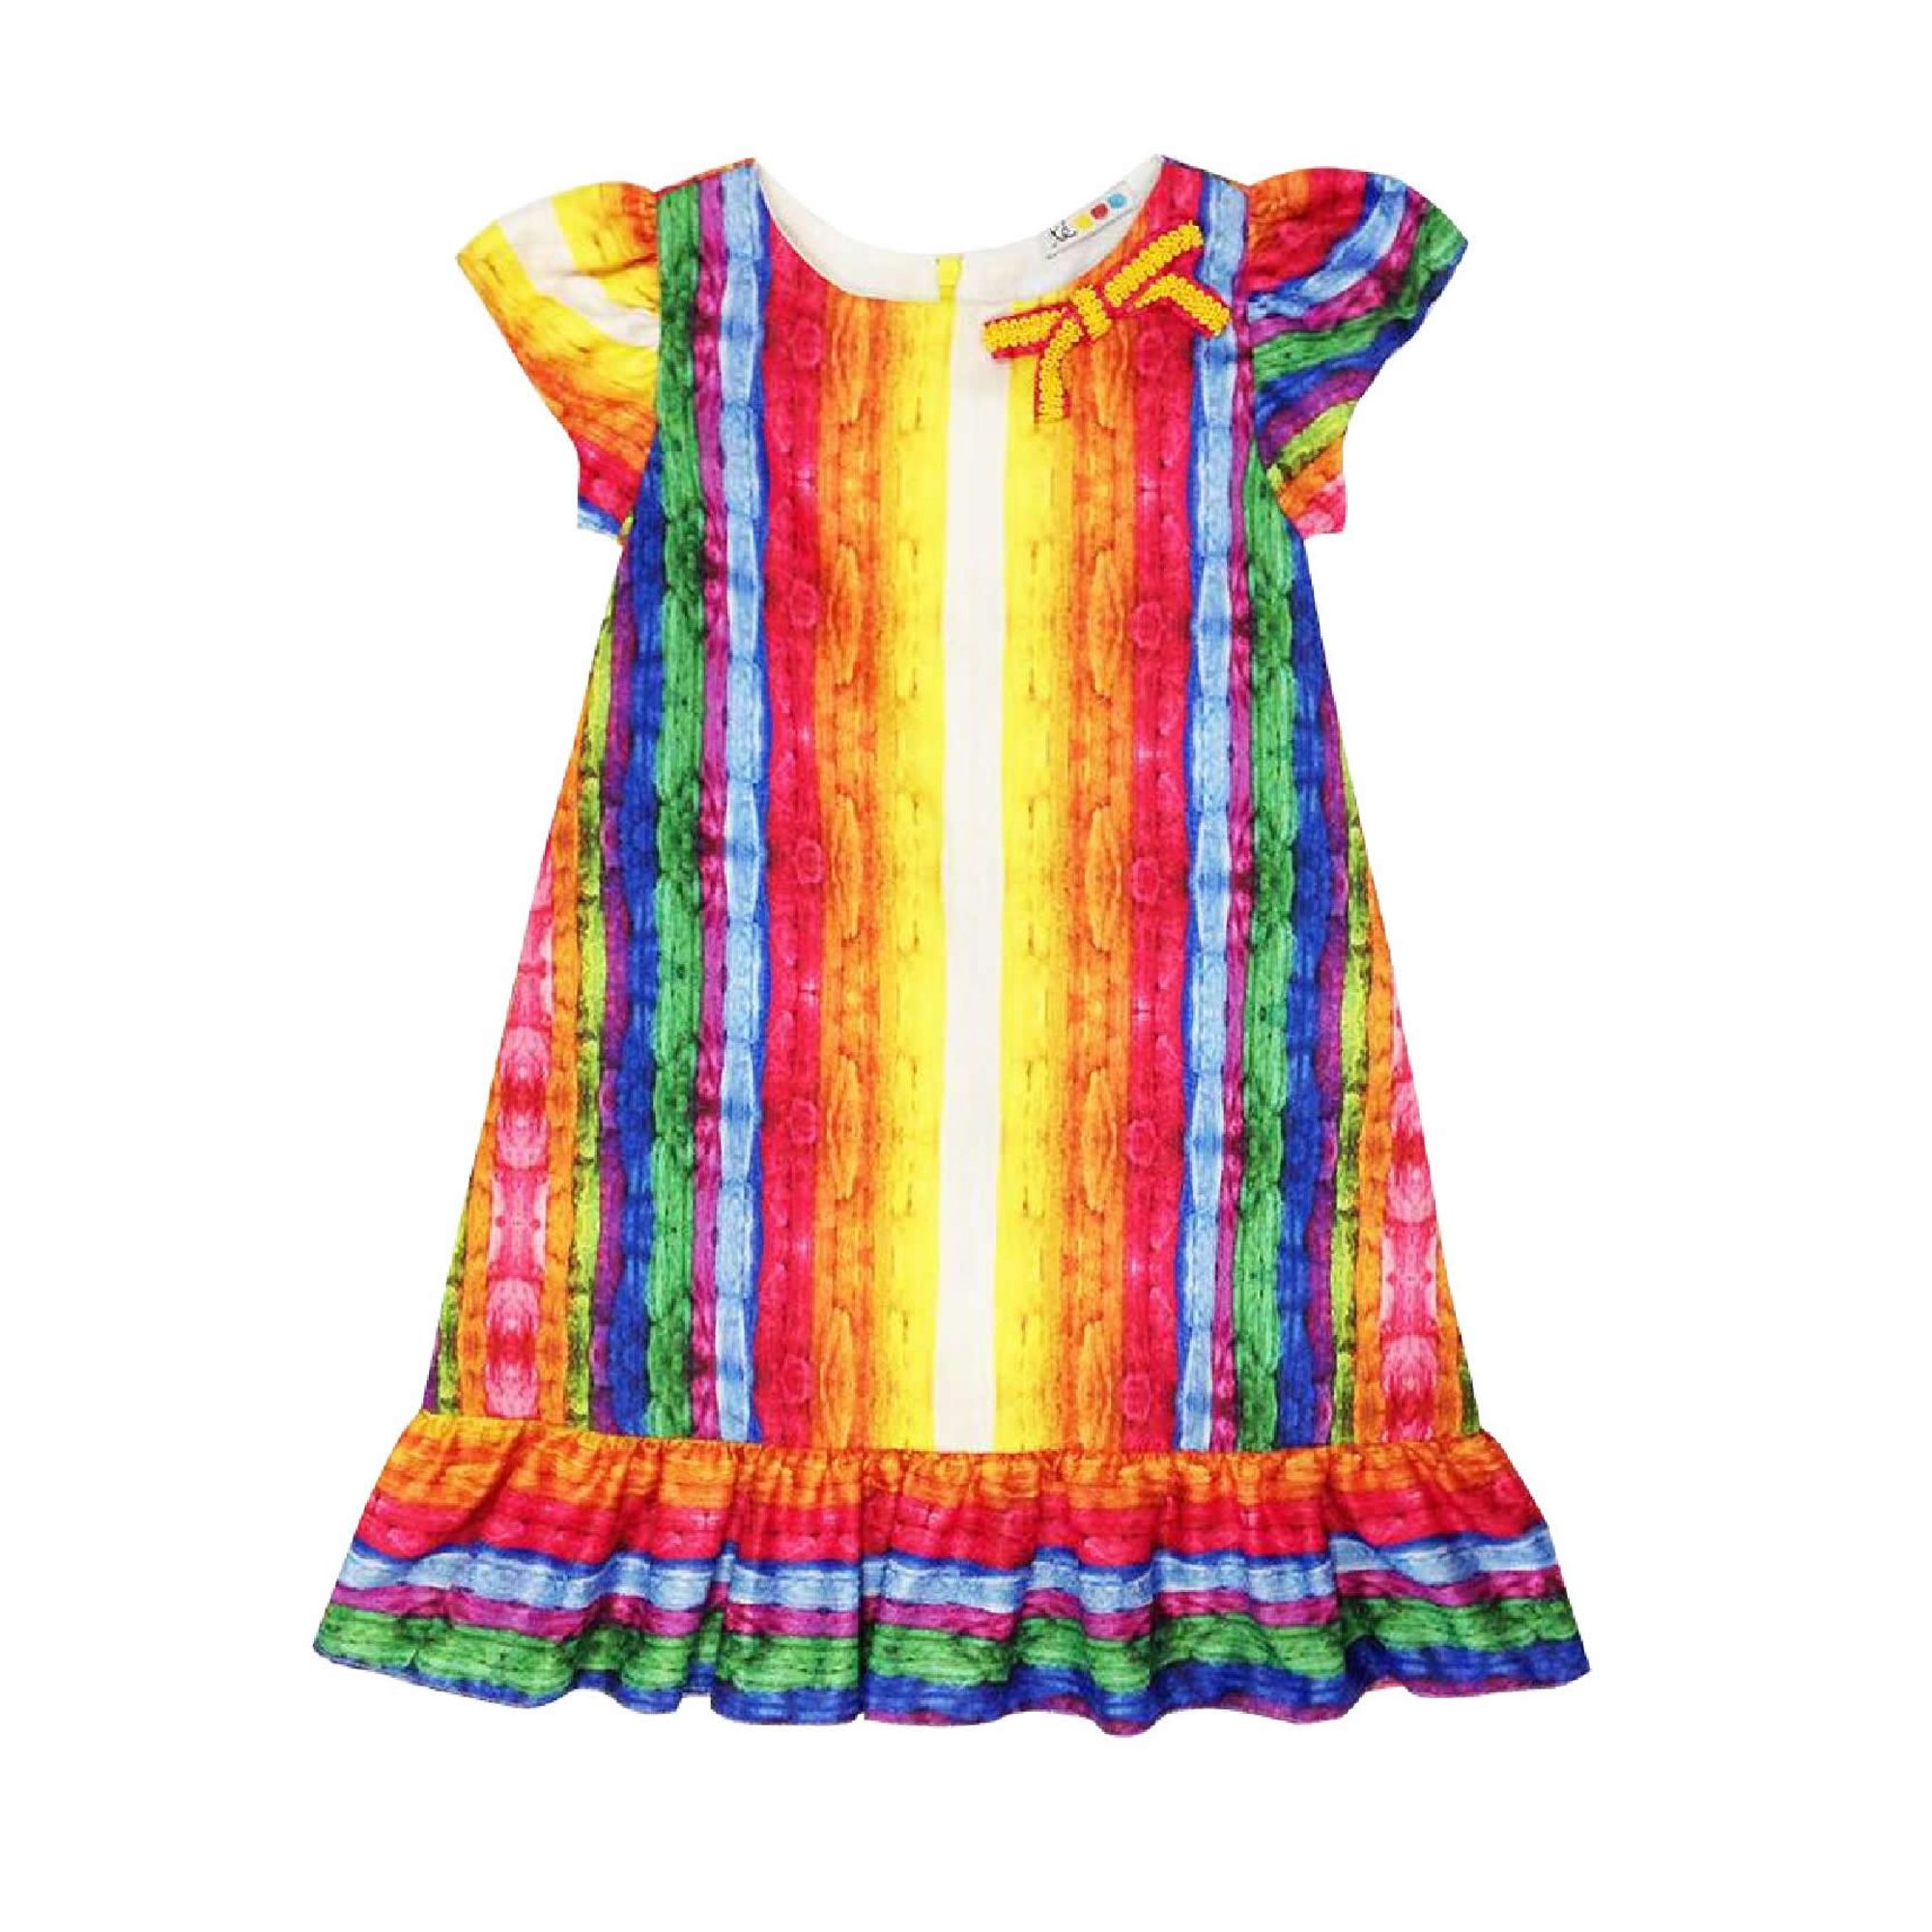 vestido-infantil-fitas-coloridas-trapezio-te-roupa-de-crianca